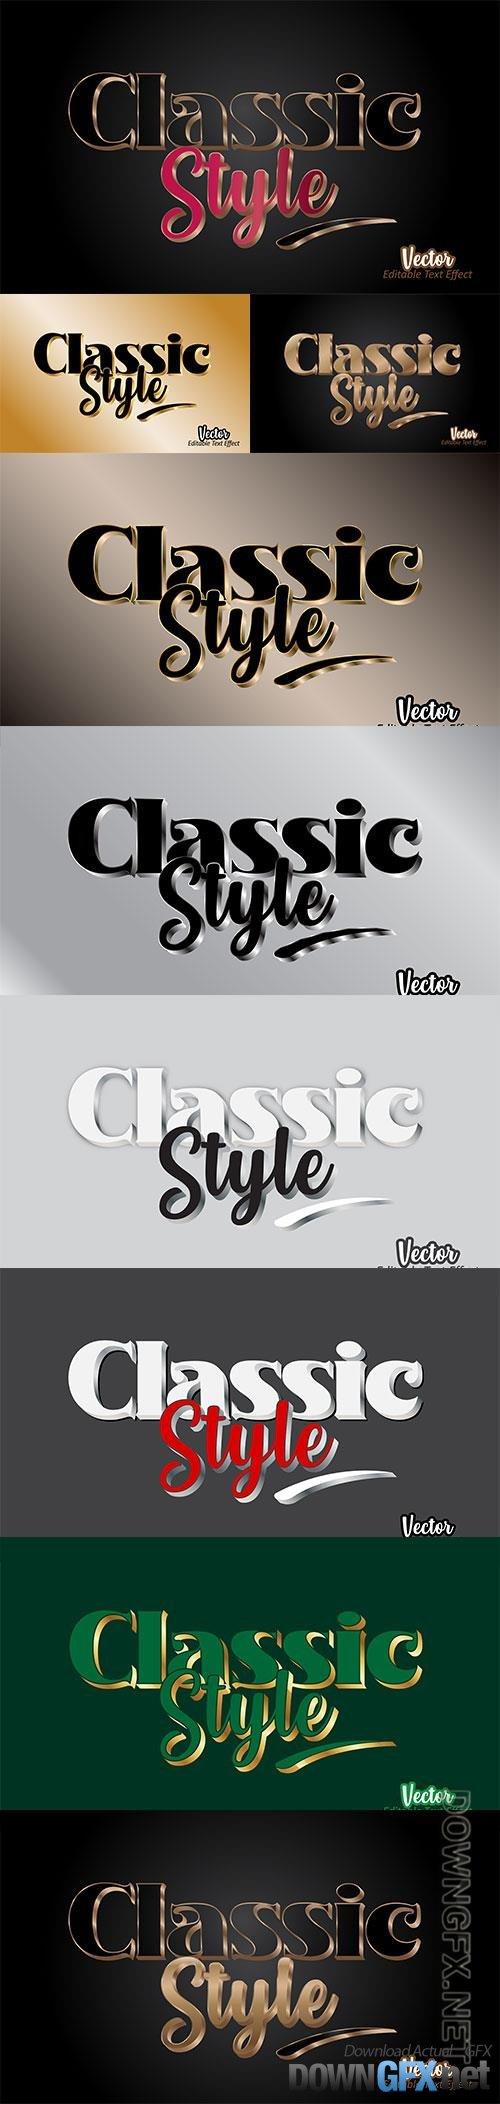 Editable classic style 3d text effect template premium vector